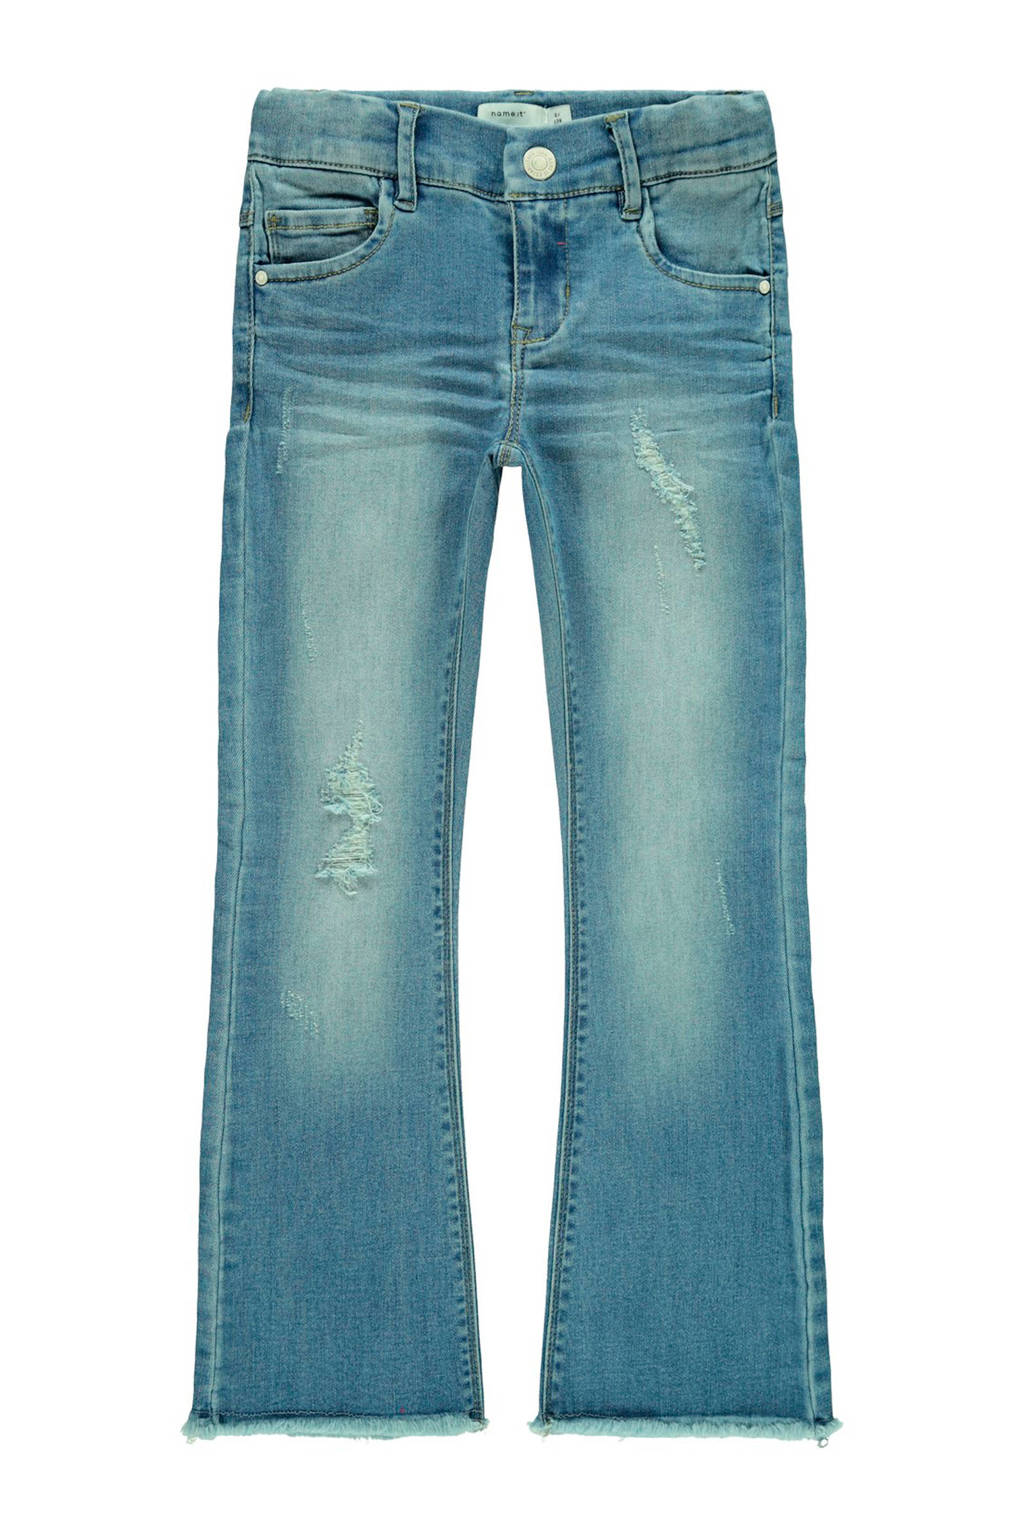 NAME IT KIDS bootcut jeans Polly stonewashed, Stonewashed